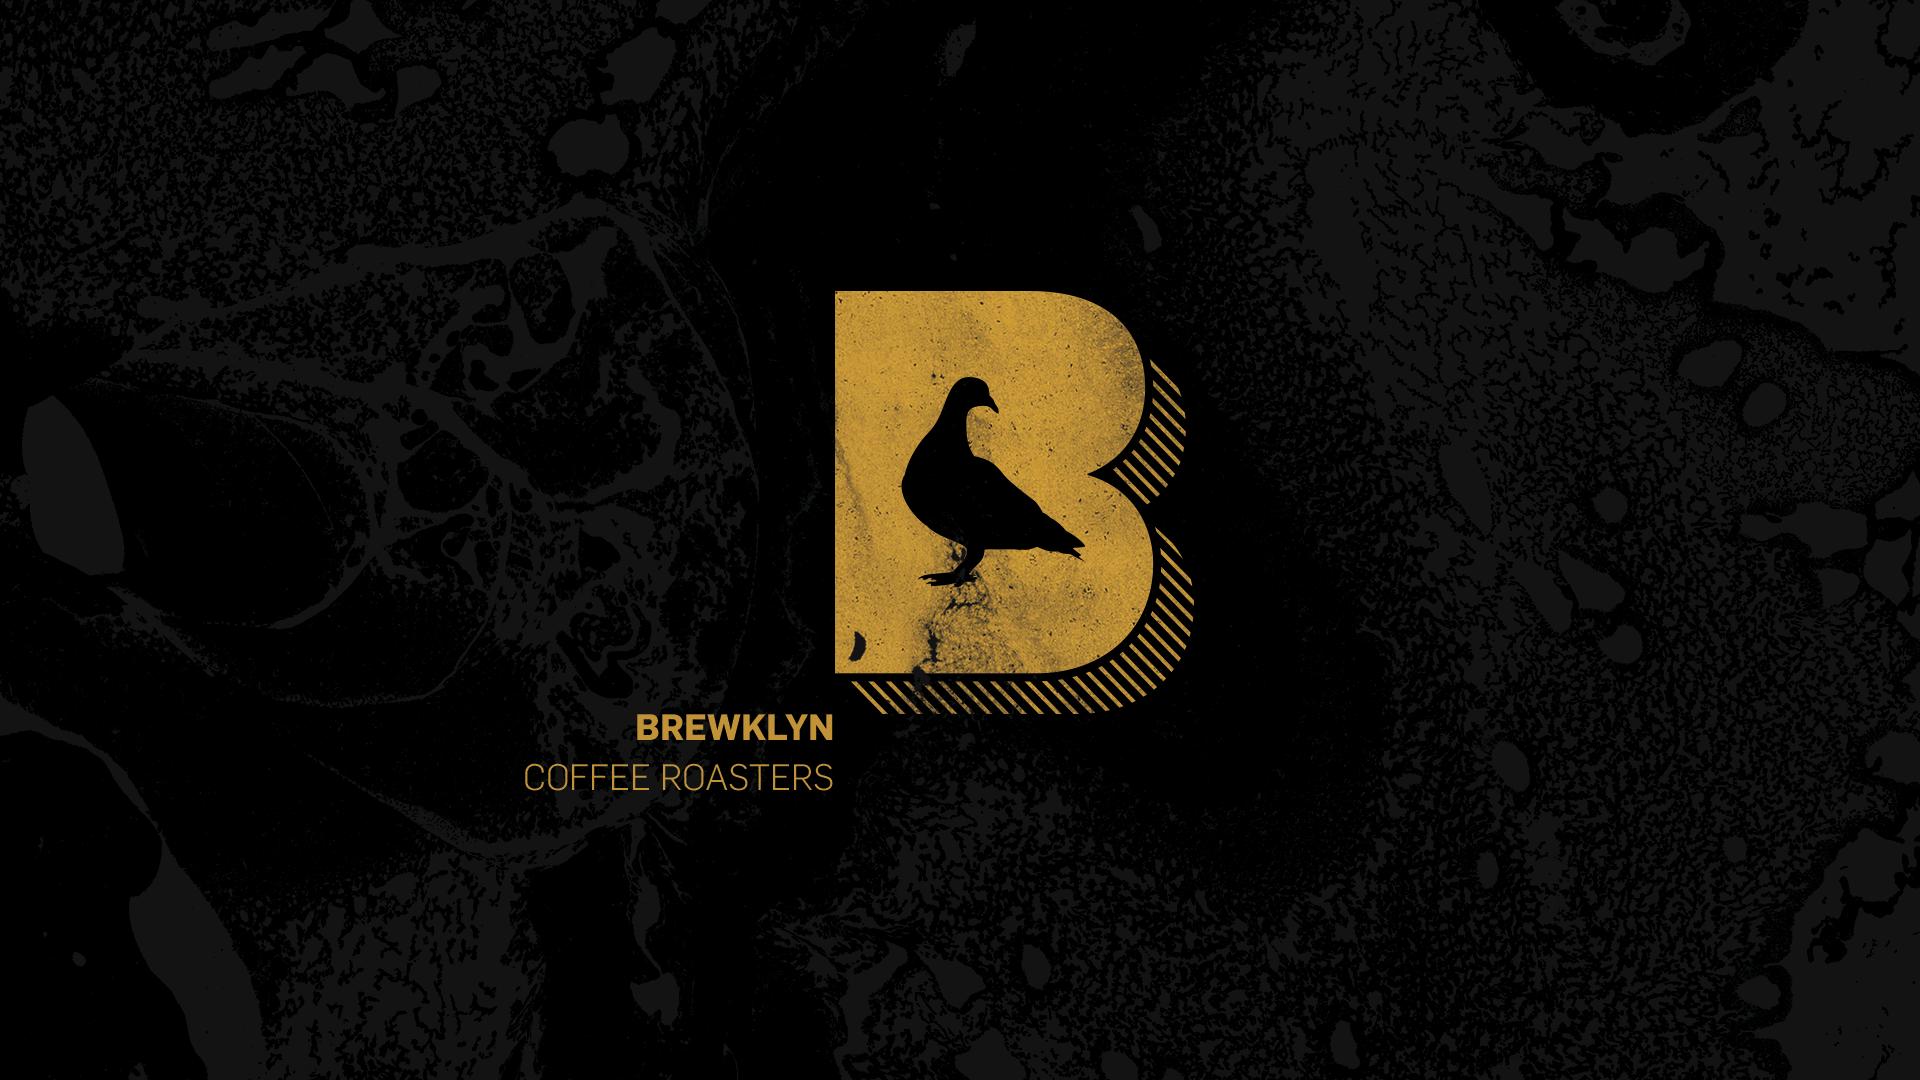 DANG_Brewklyn_slide_logo